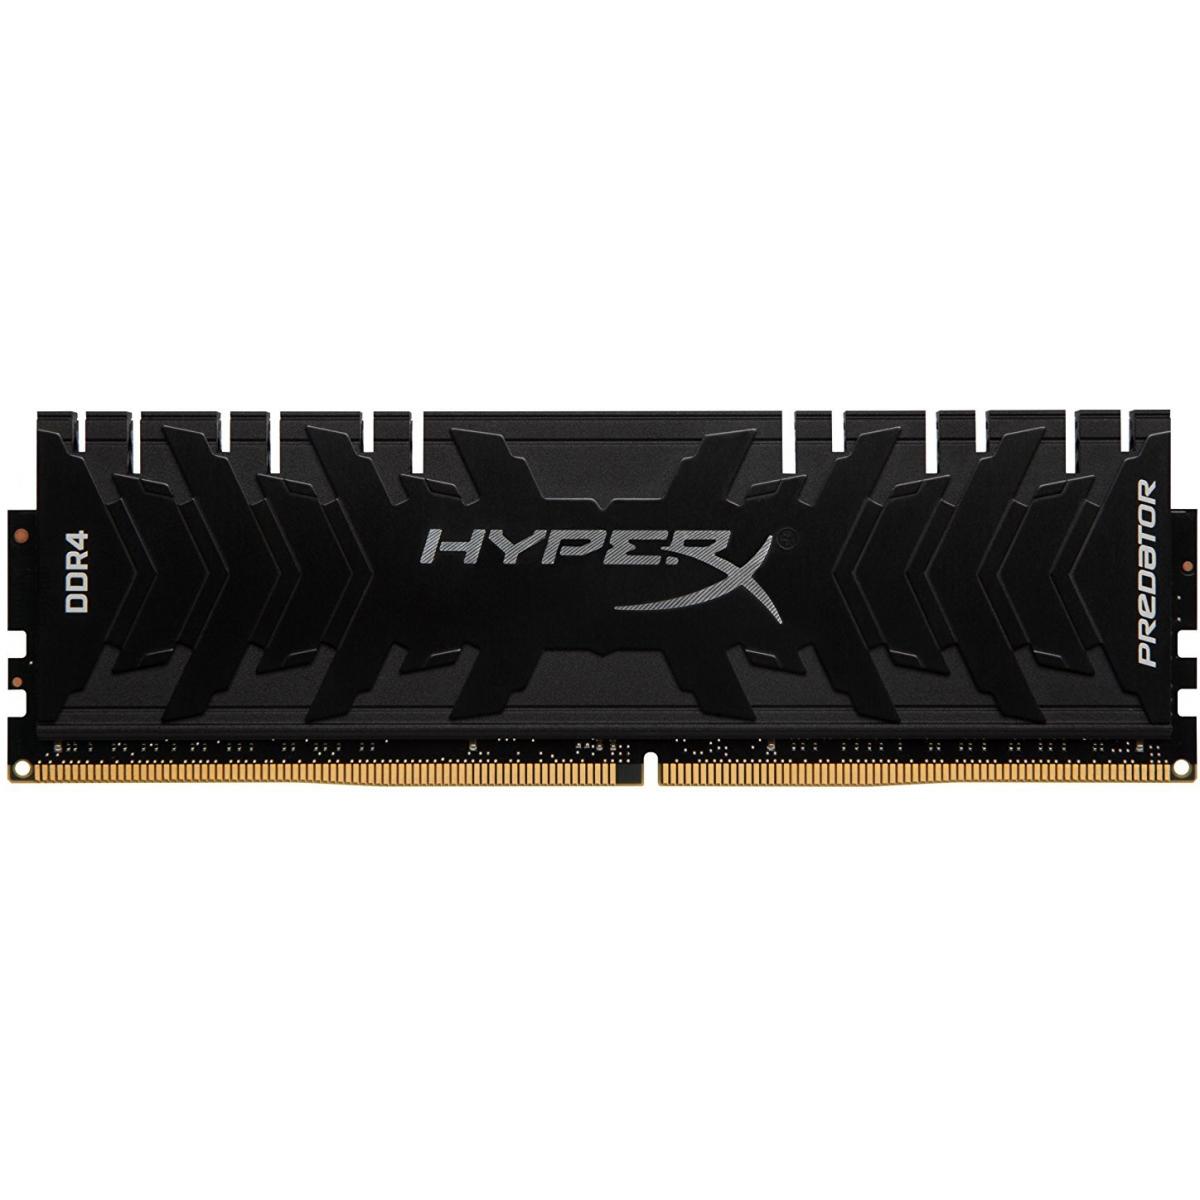 Memória DDR4 Kingston HyperX Predator, 8GB 2400MHZ, HX424C12PB3/8